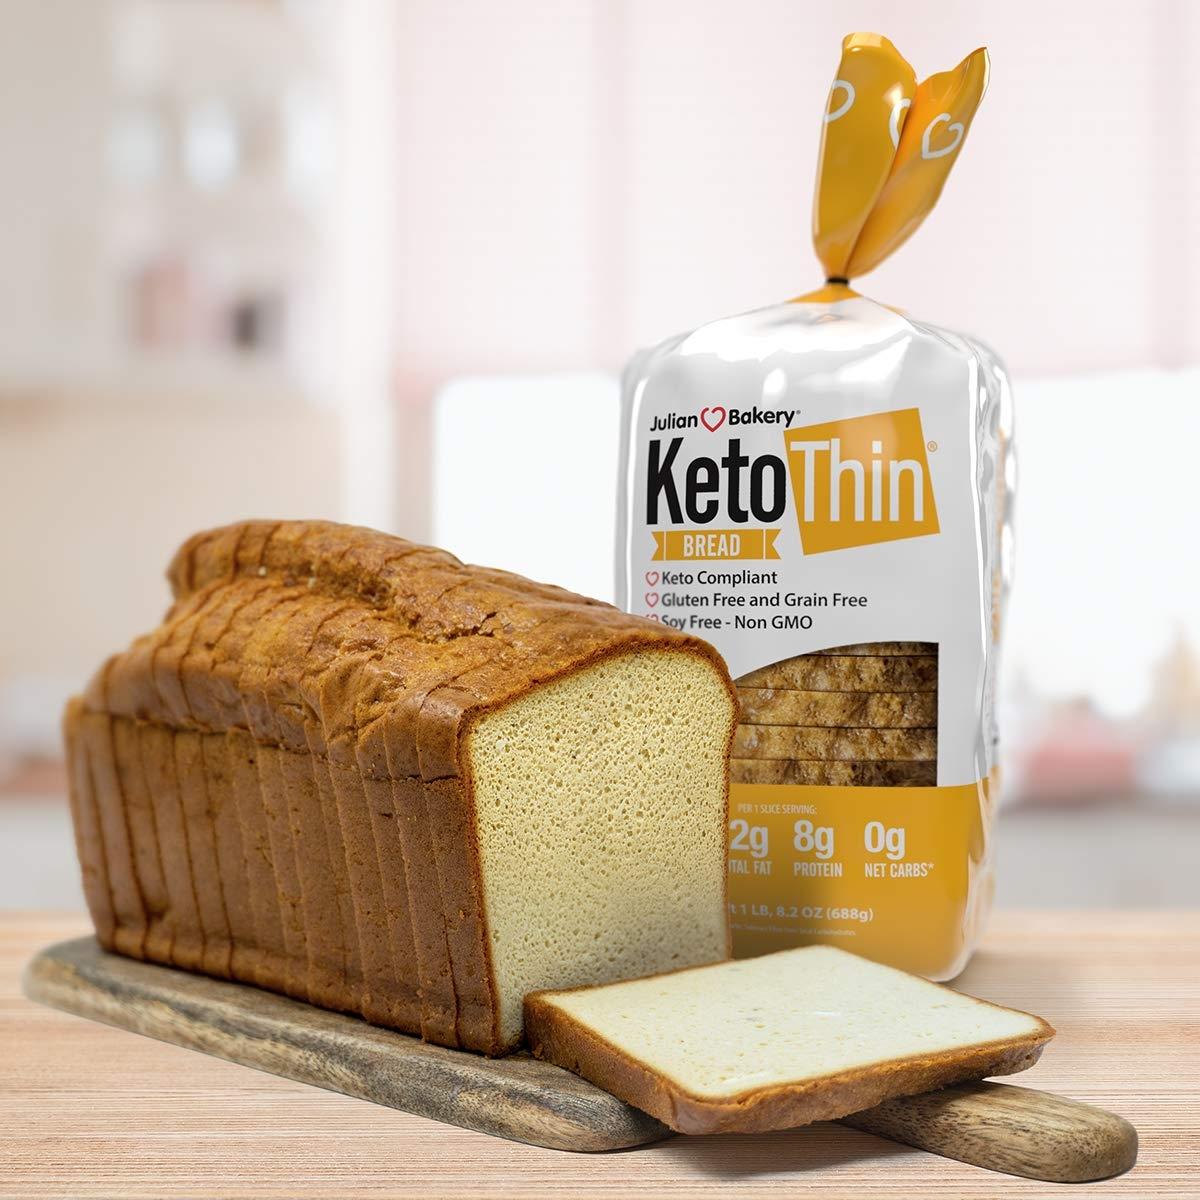 Julian Bakery Keto Thin Bread